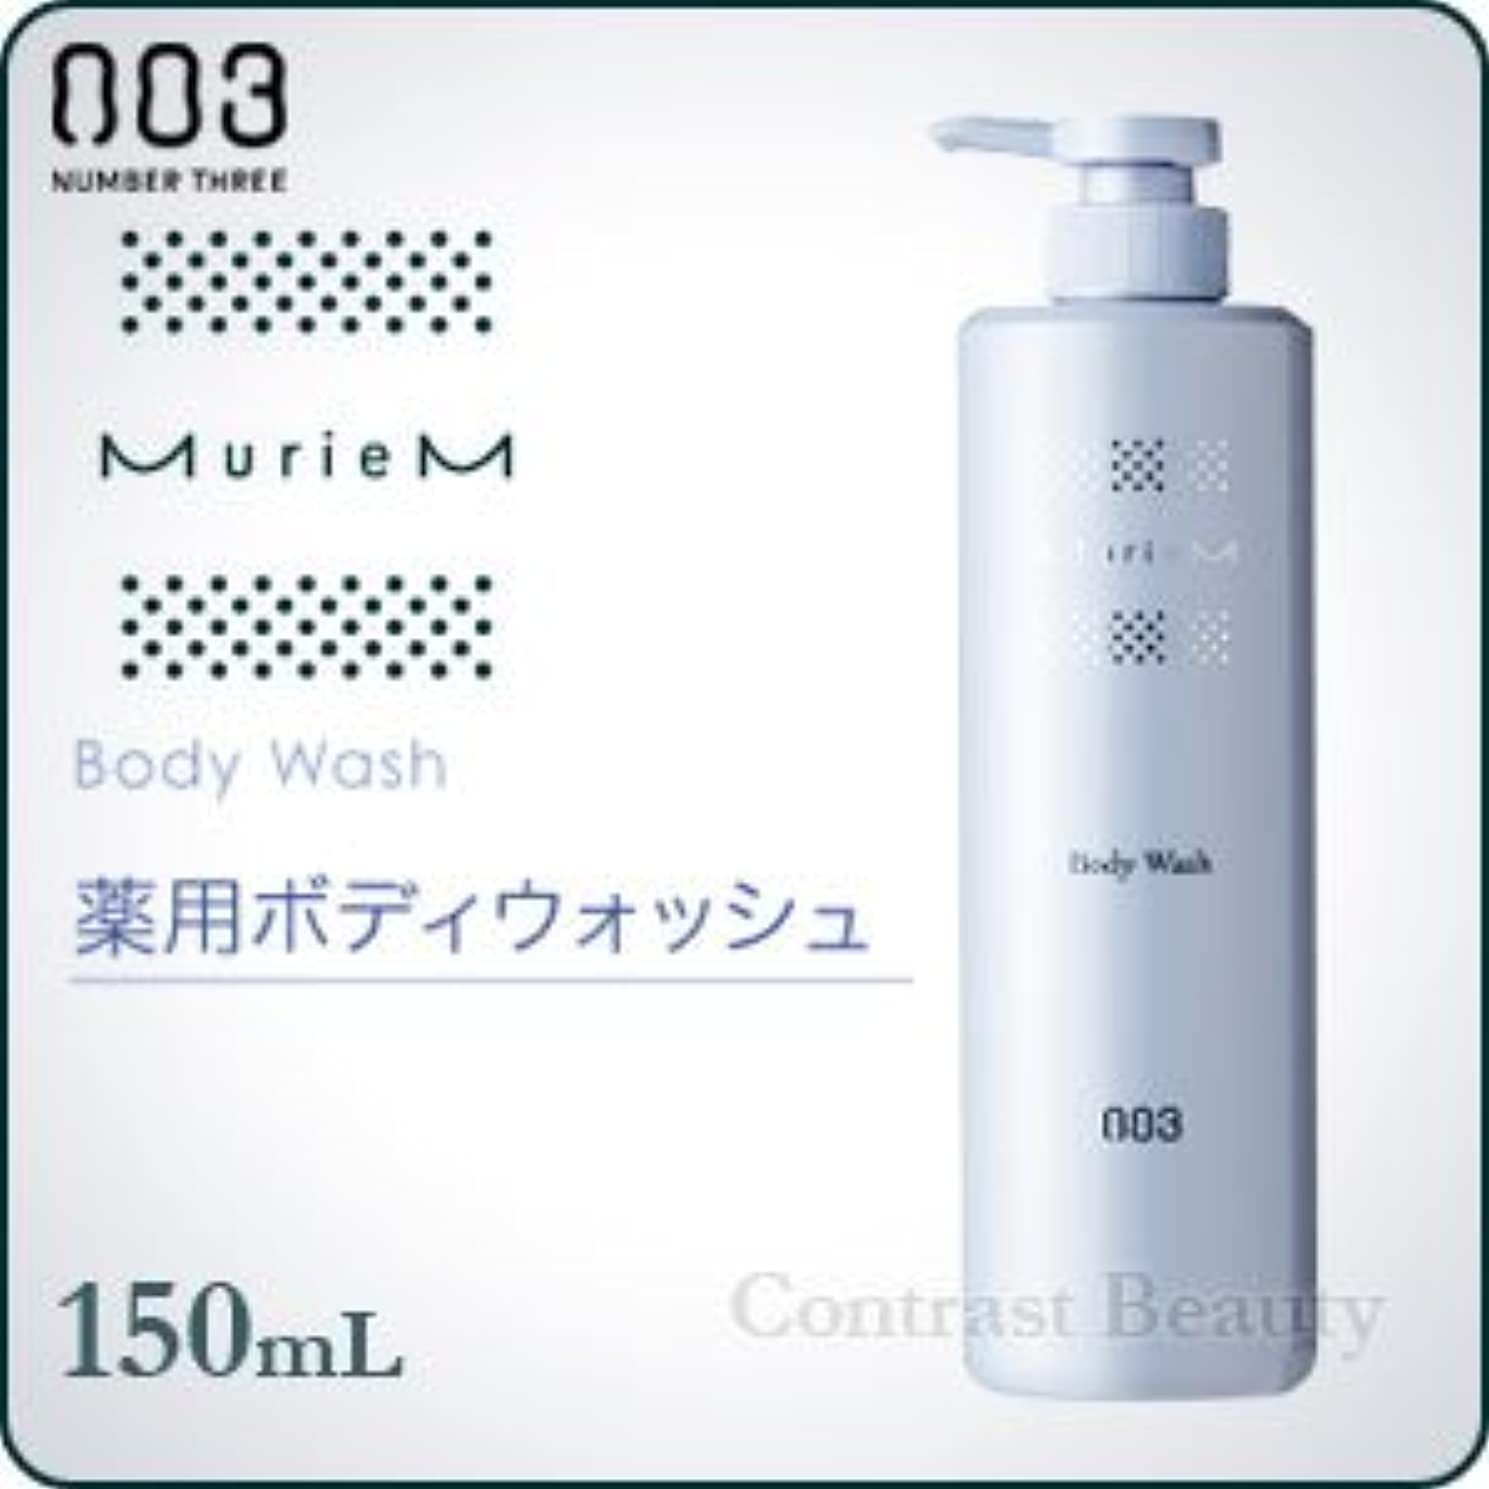 【X2個セット】 ナンバースリー ミュリアム クリスタル 薬用ボディウォッシュ 600ml 医薬部外品